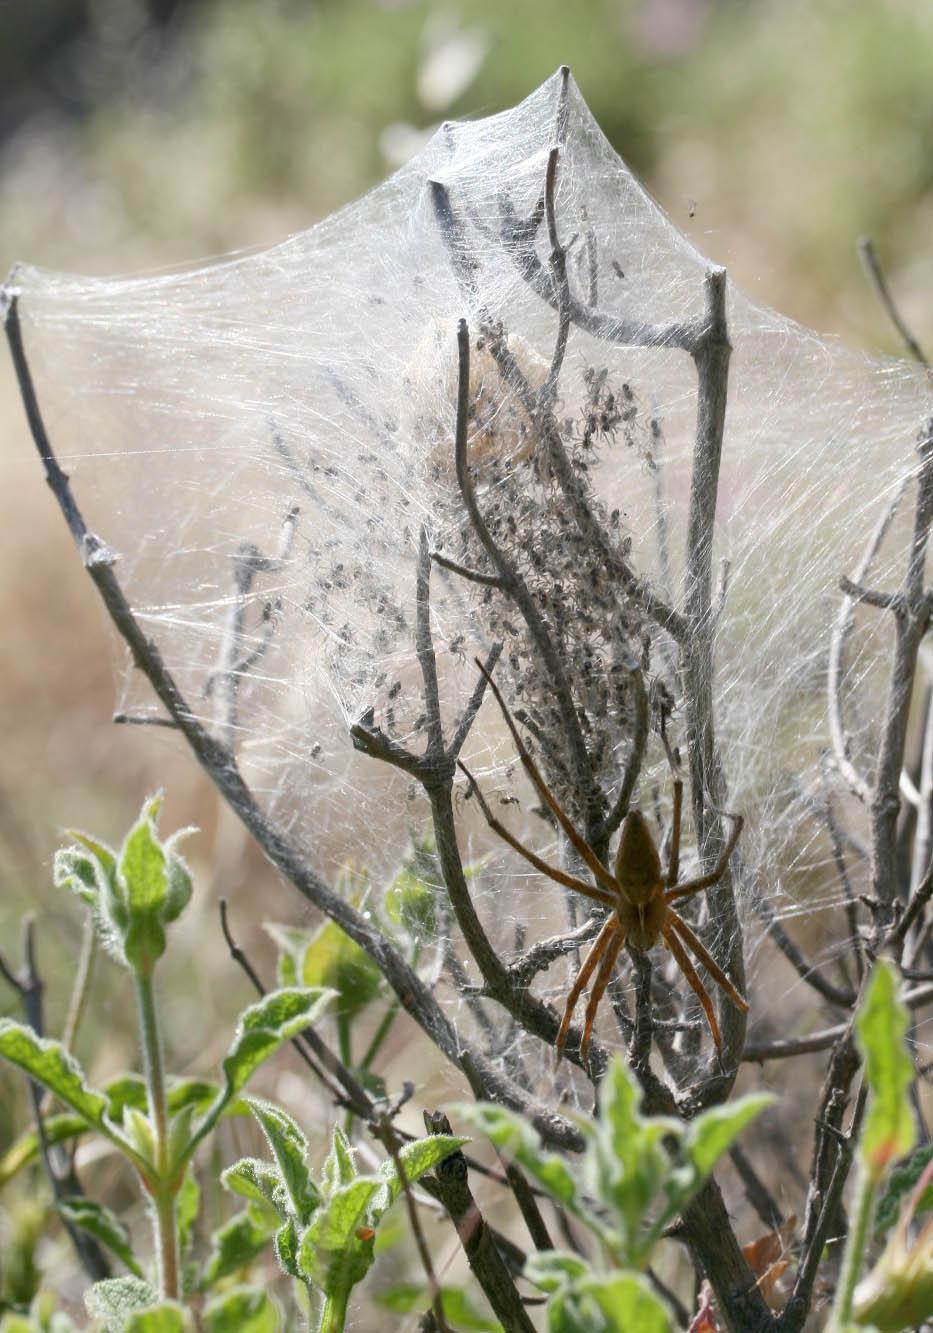 Pisaura mirabilis - Listspinne - Fam. Pisauridae  -   Nisyros - Araneae - Webspinnen - orb-weaver spiders